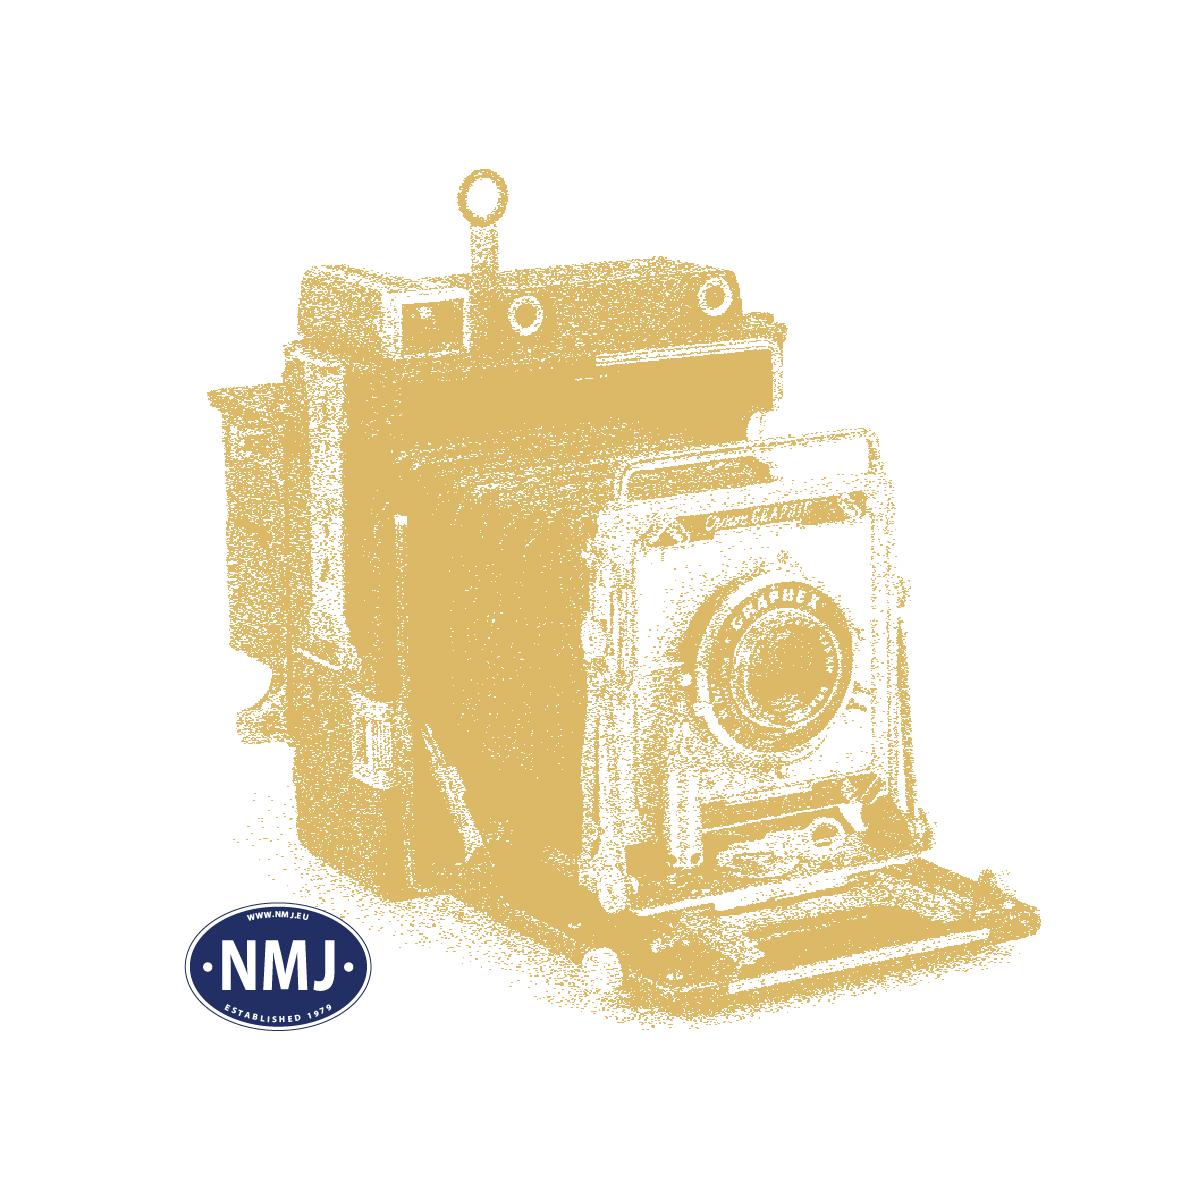 NMJT504.201 - NMJ Topline NSB His 210 2 821-6